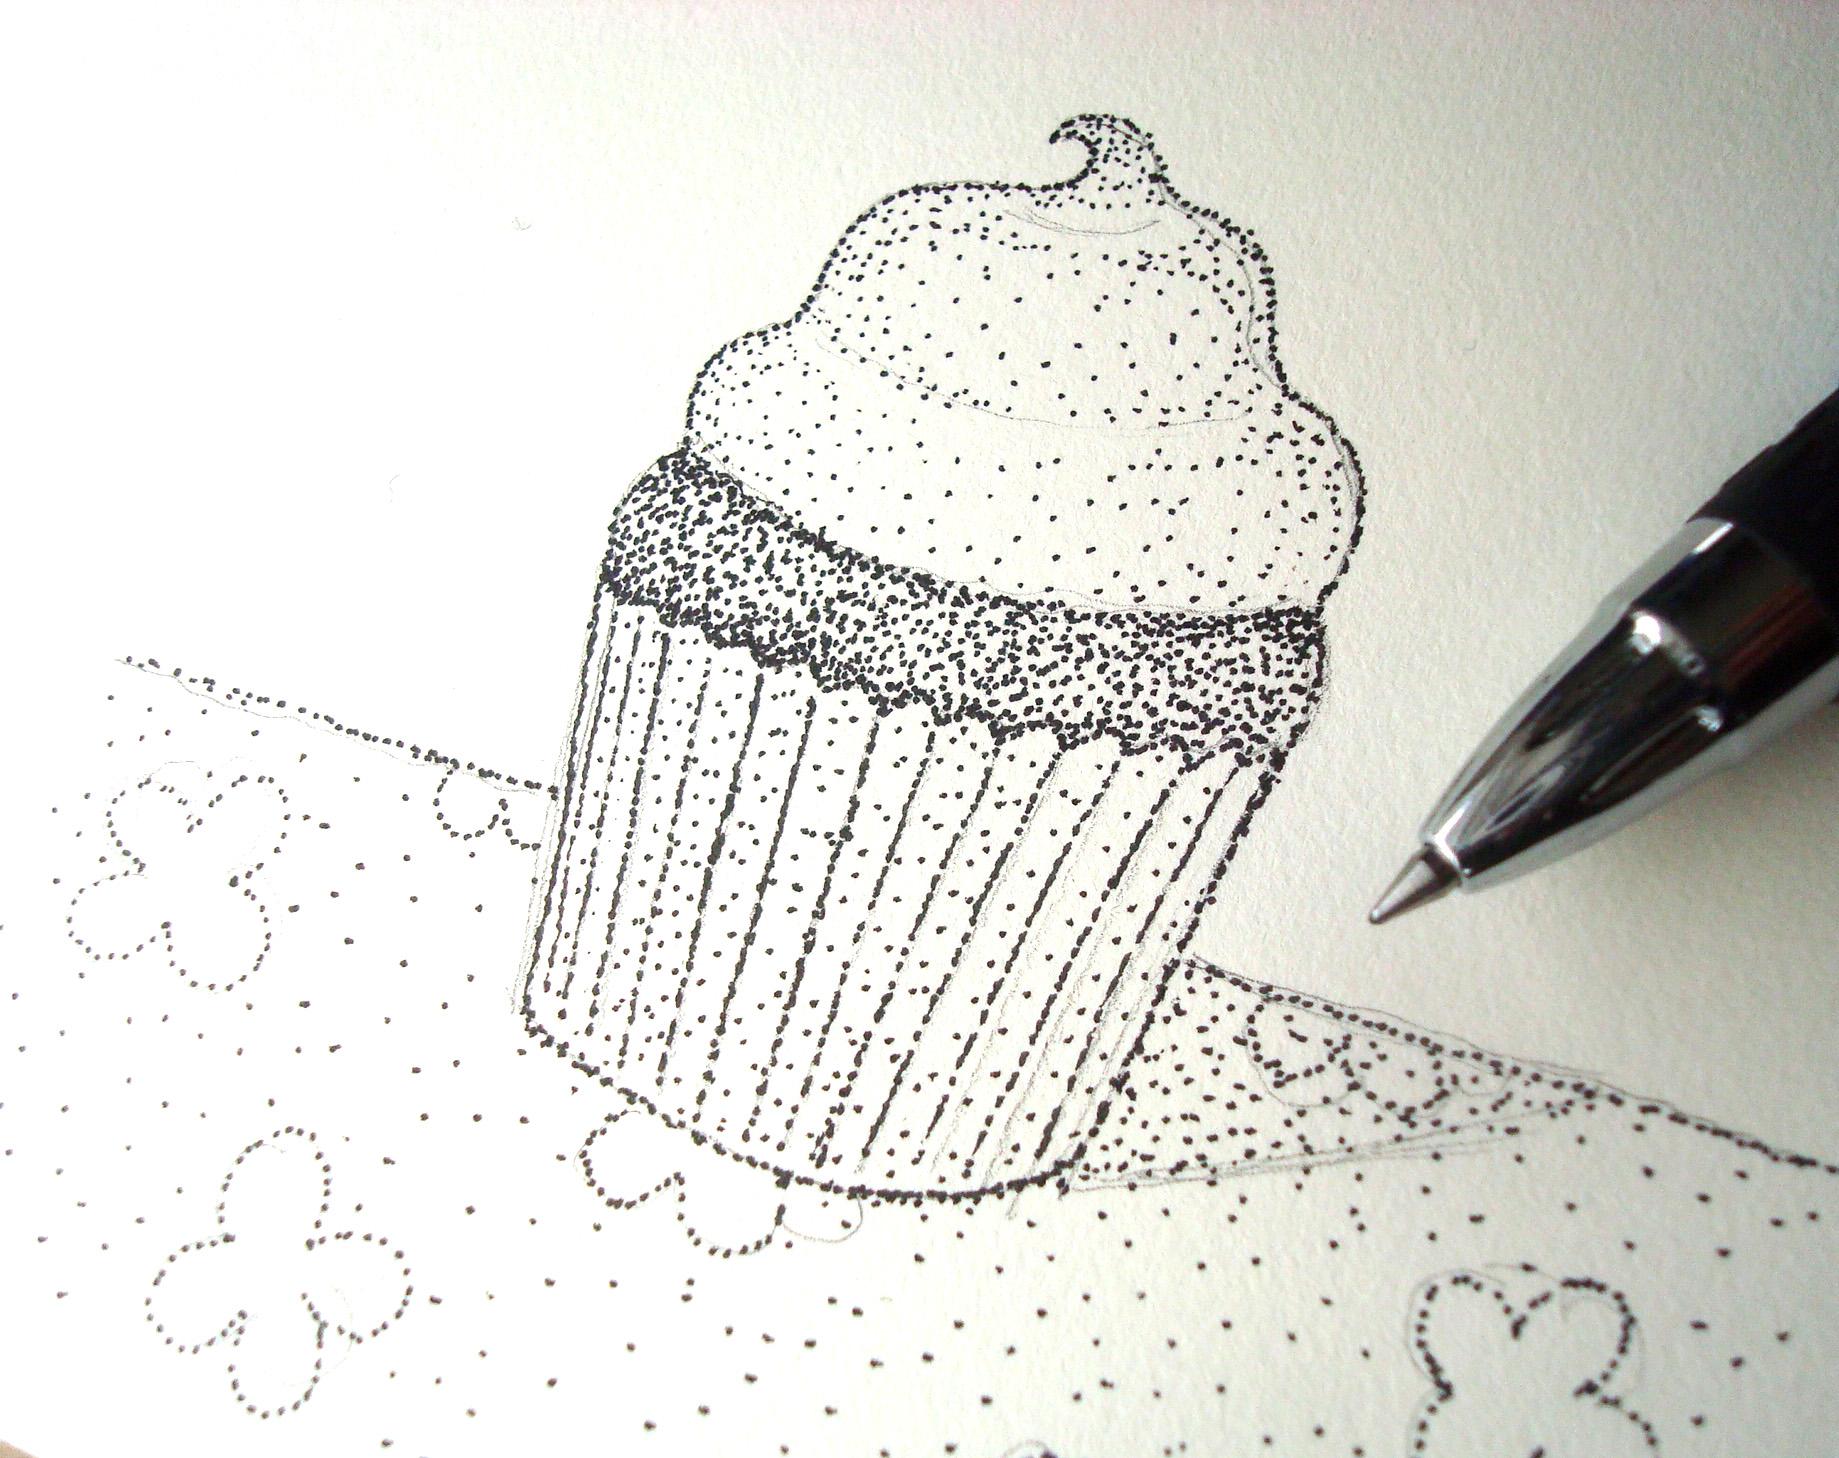 Stippled drawing